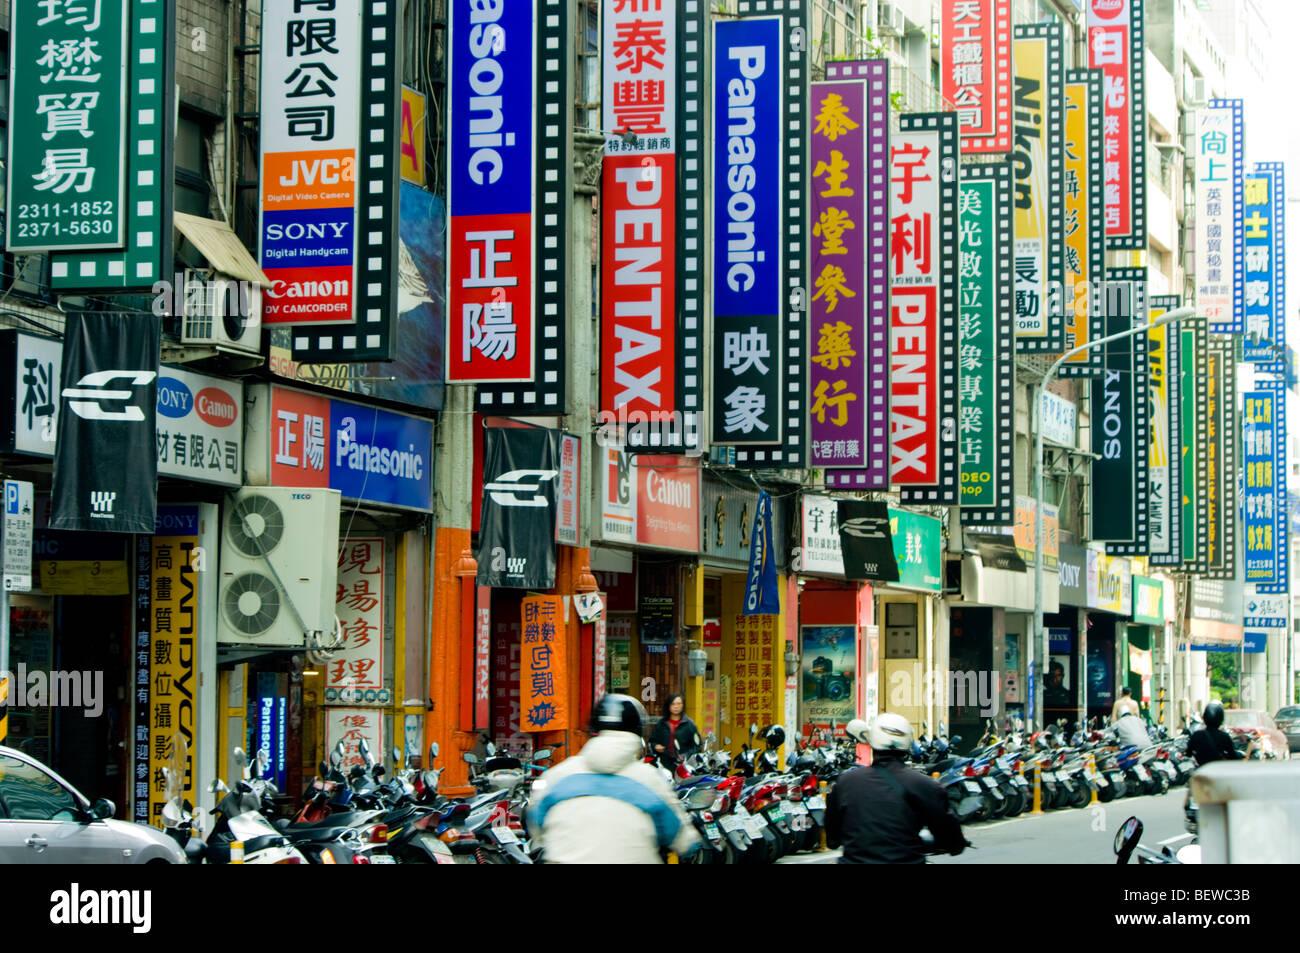 shopping stree in Taipeh, Taiwan - Stock Image